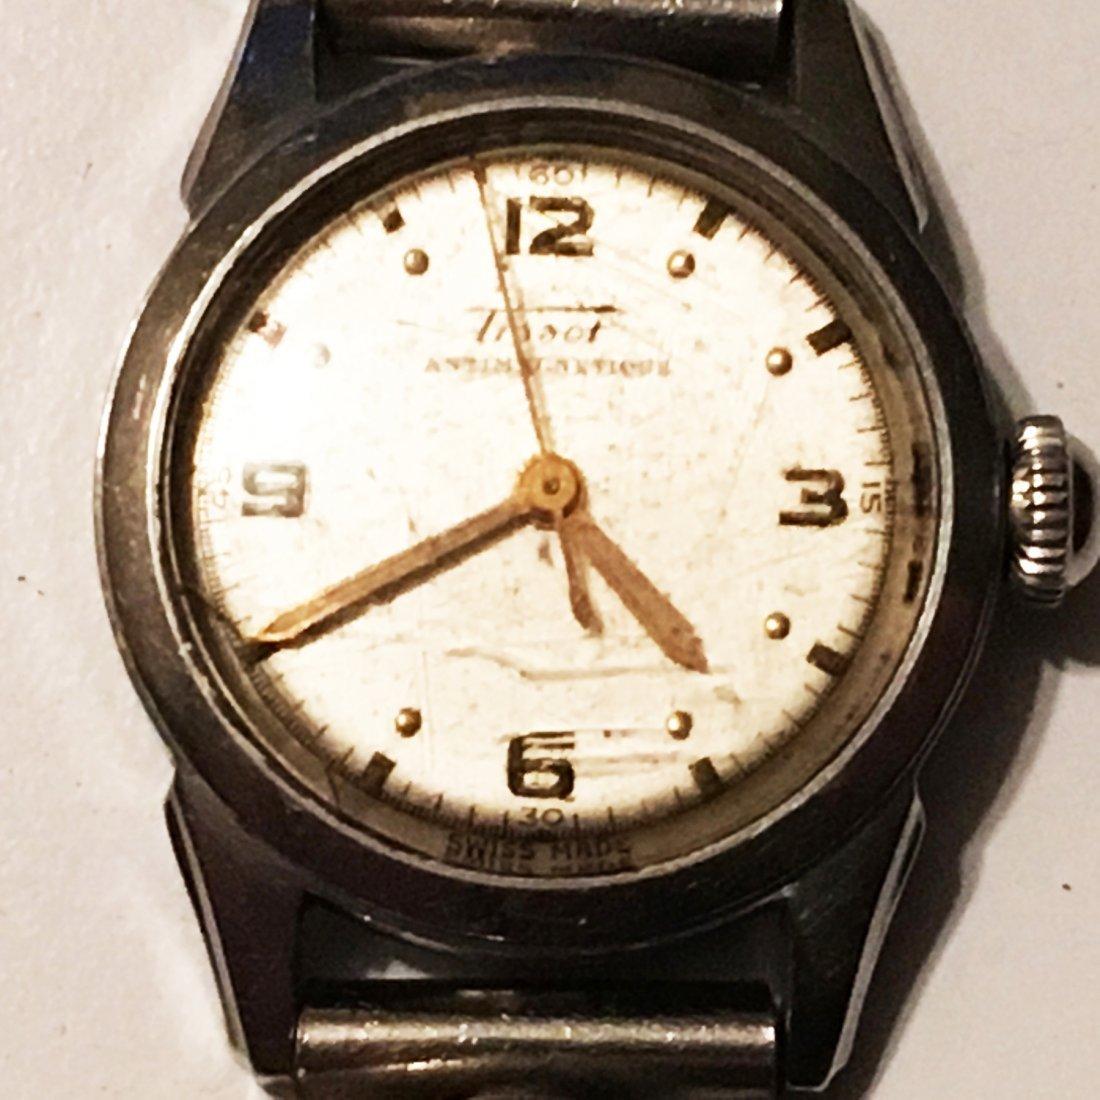 Tissot Swiss Antimagnetique watch - 2